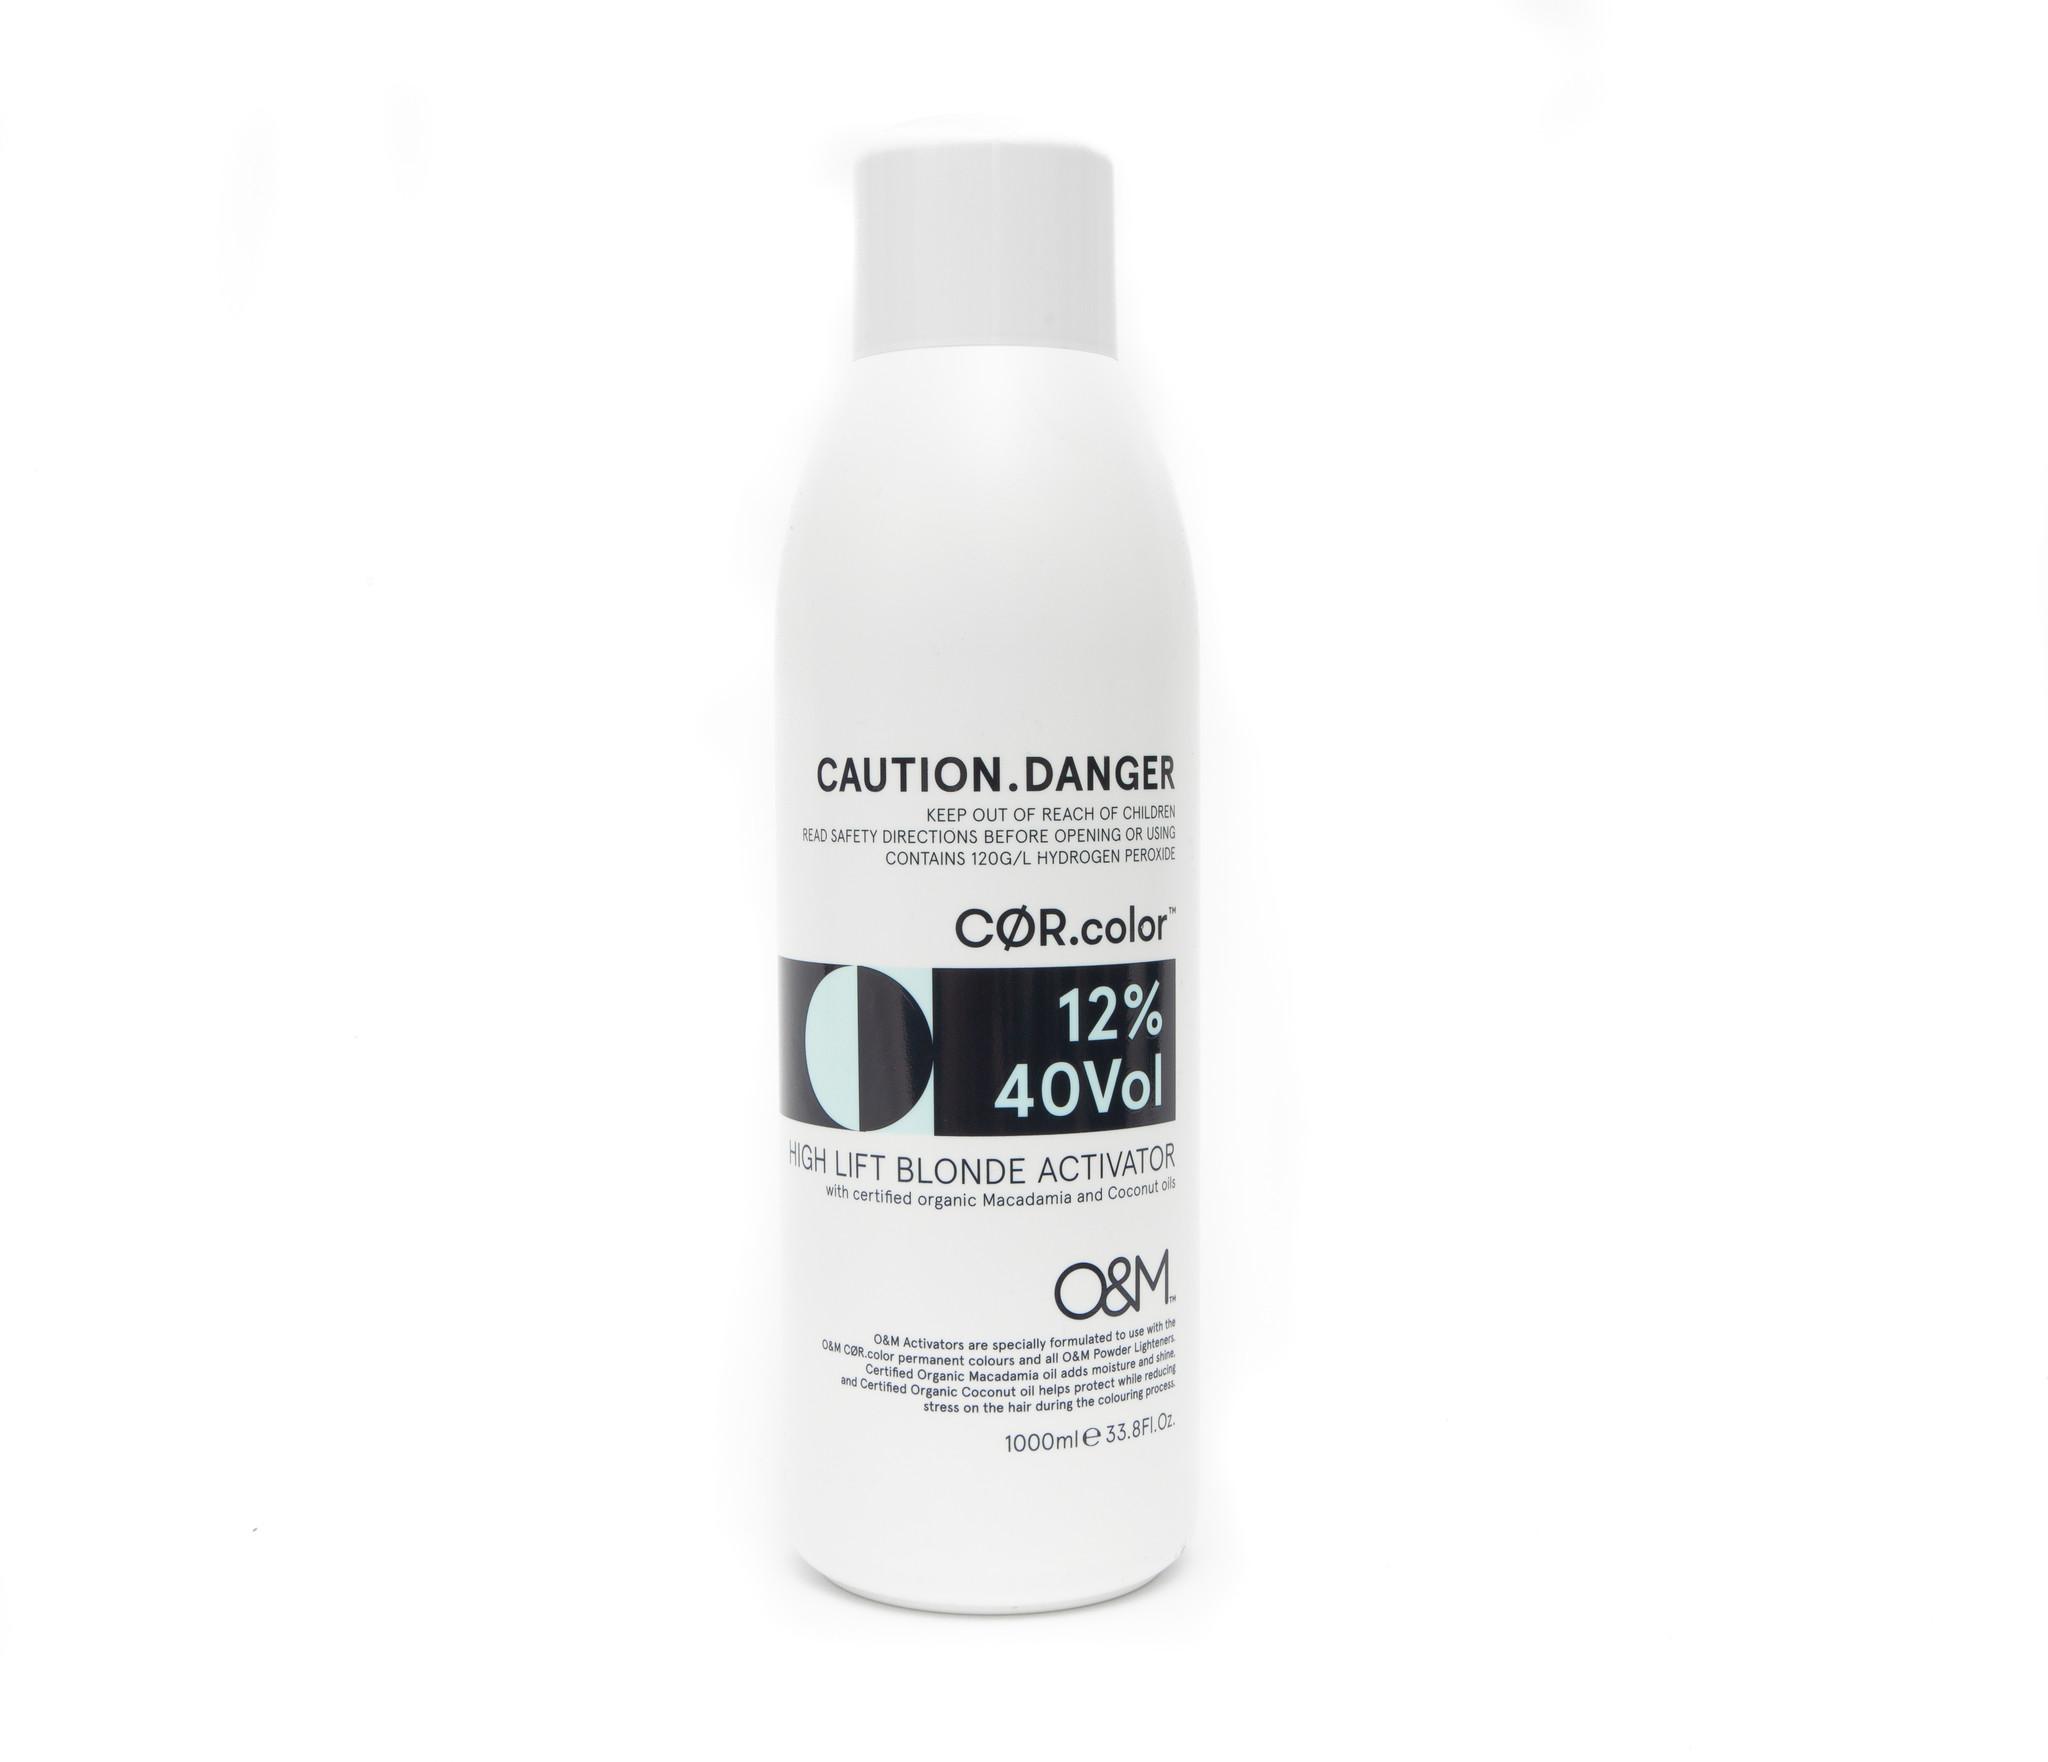 O&M - Original Mineral O&M CØR.COLOR High Lift Blonde 40 Vol - 12% - 1000 ml